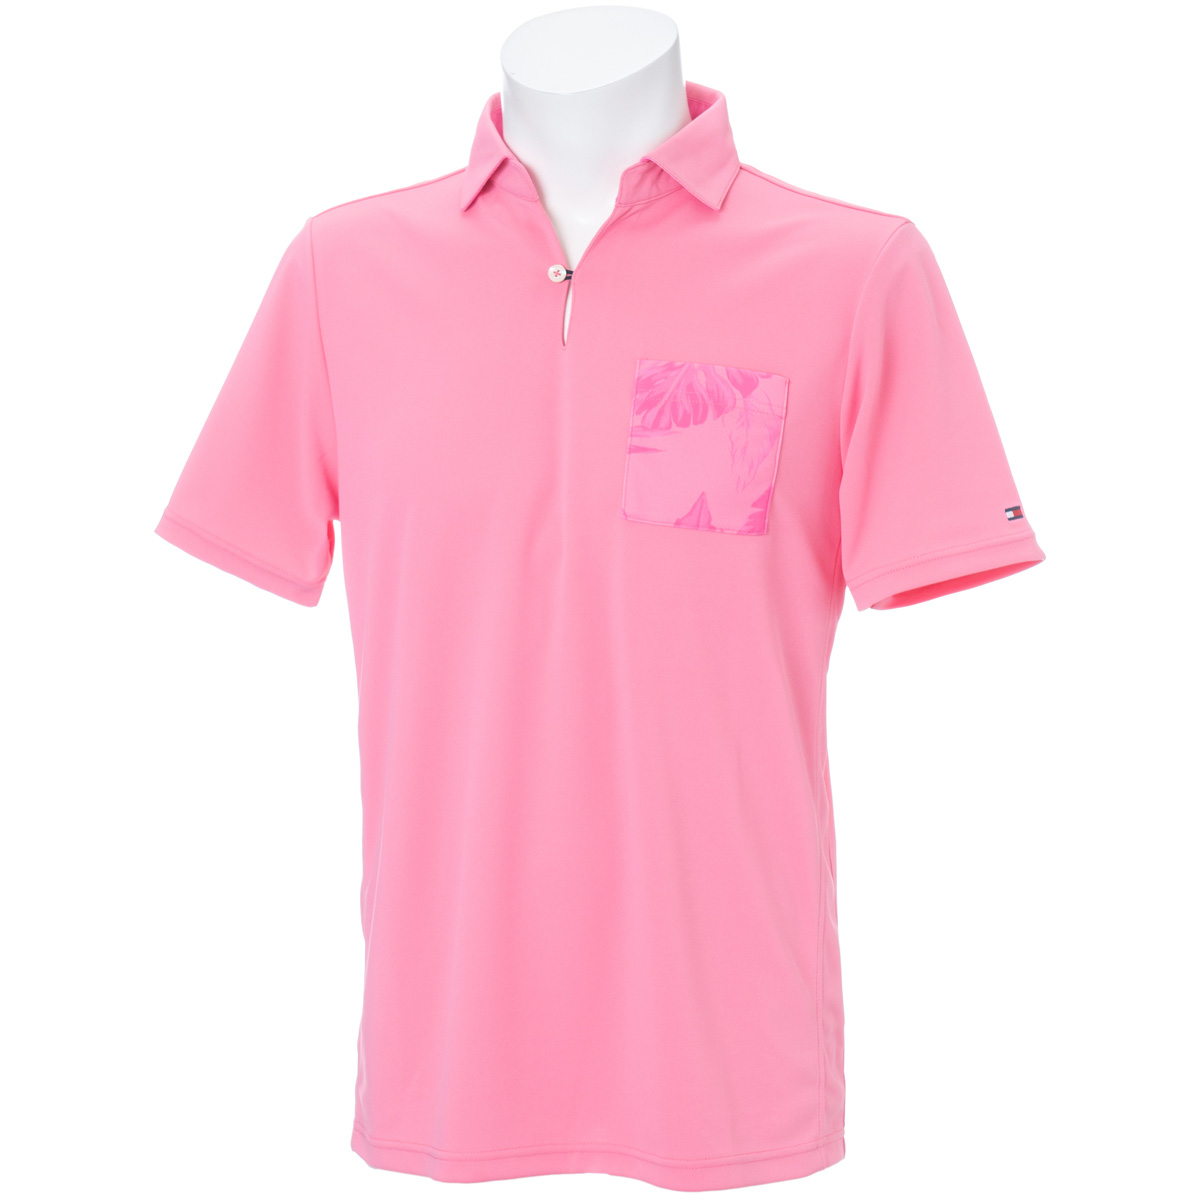 POCKET 半袖ポロシャツ